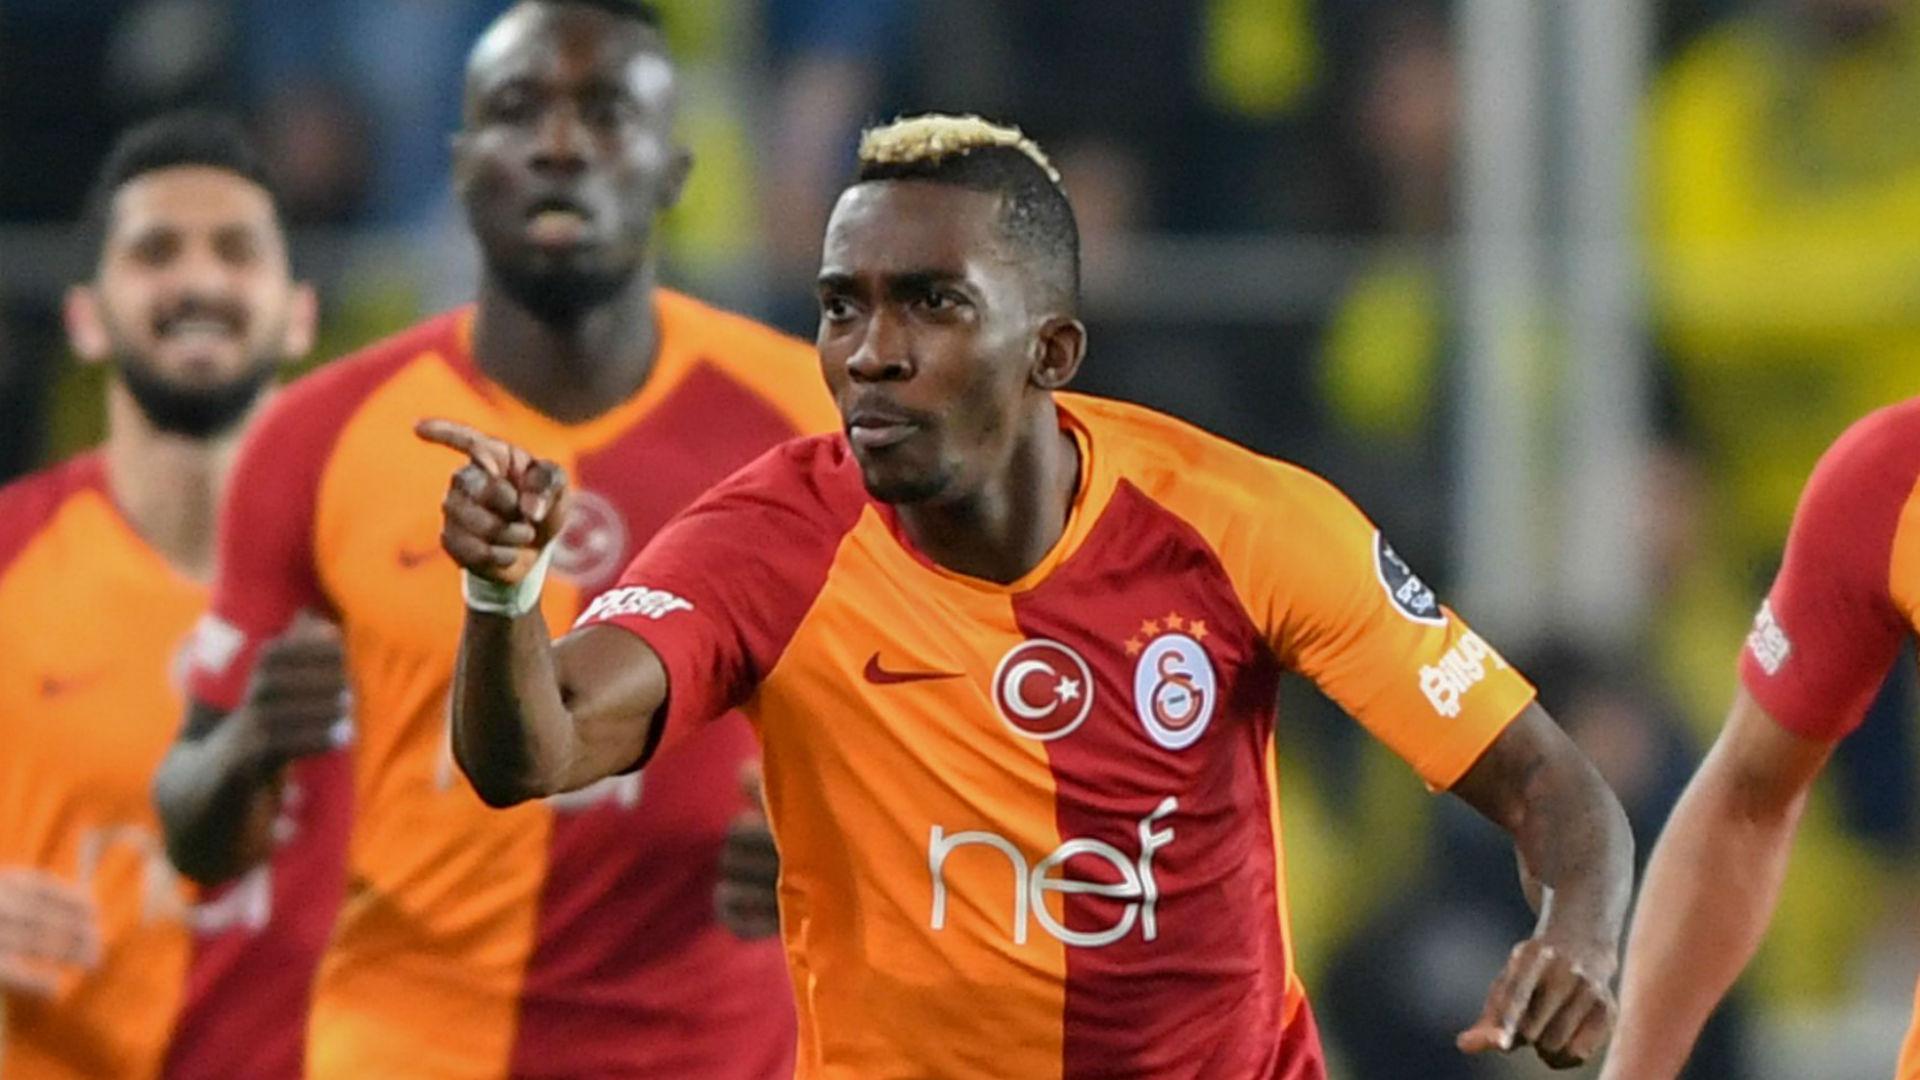 Coronavirus: Onyekuru sends support message to Galatasaray vice president after positive test